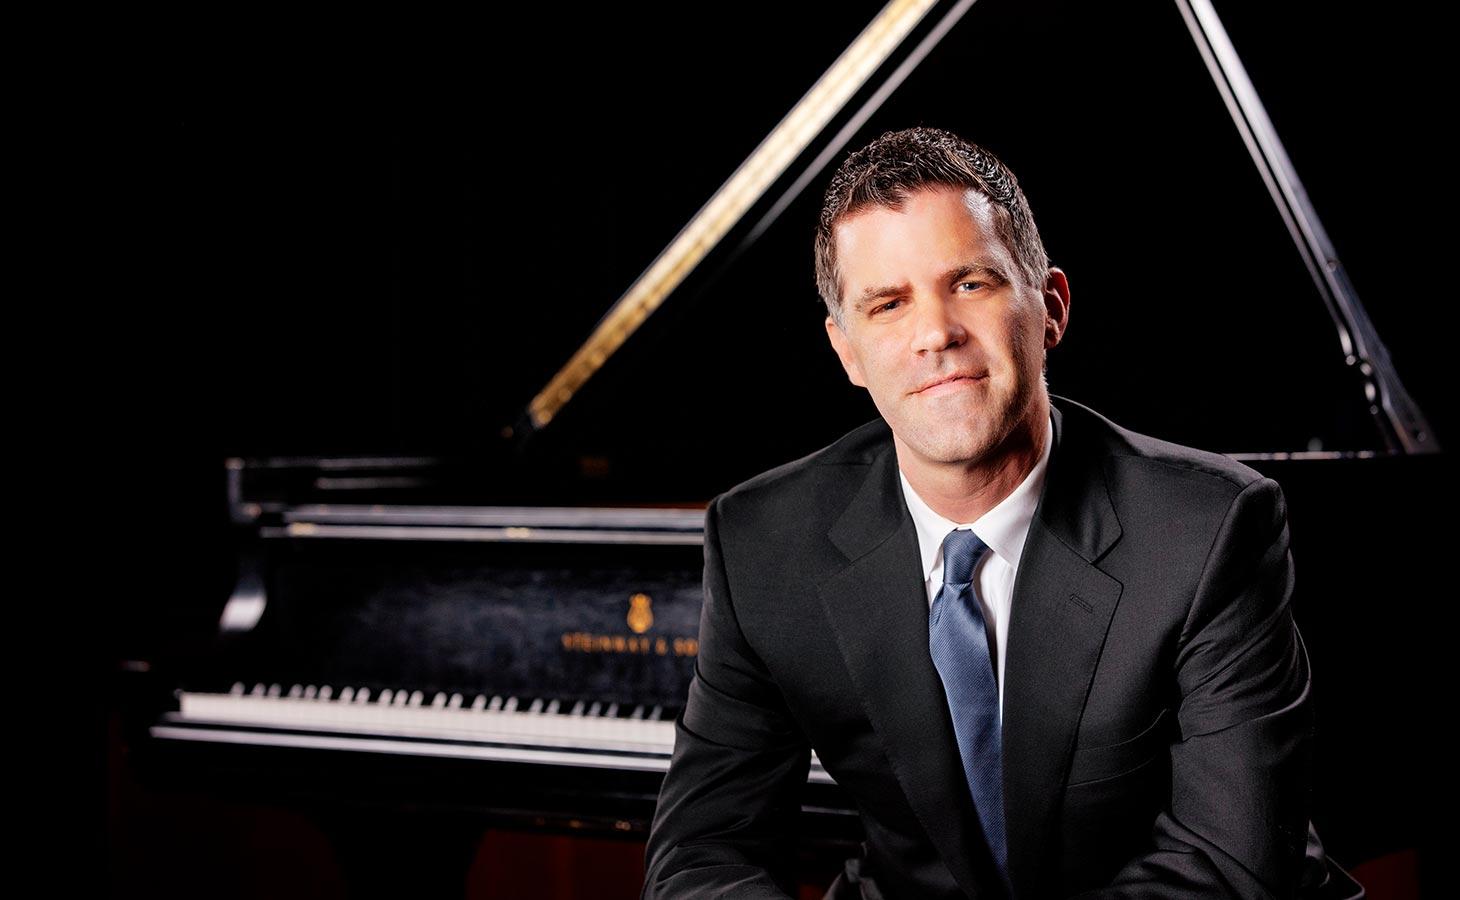 Joseph Rackers at piano